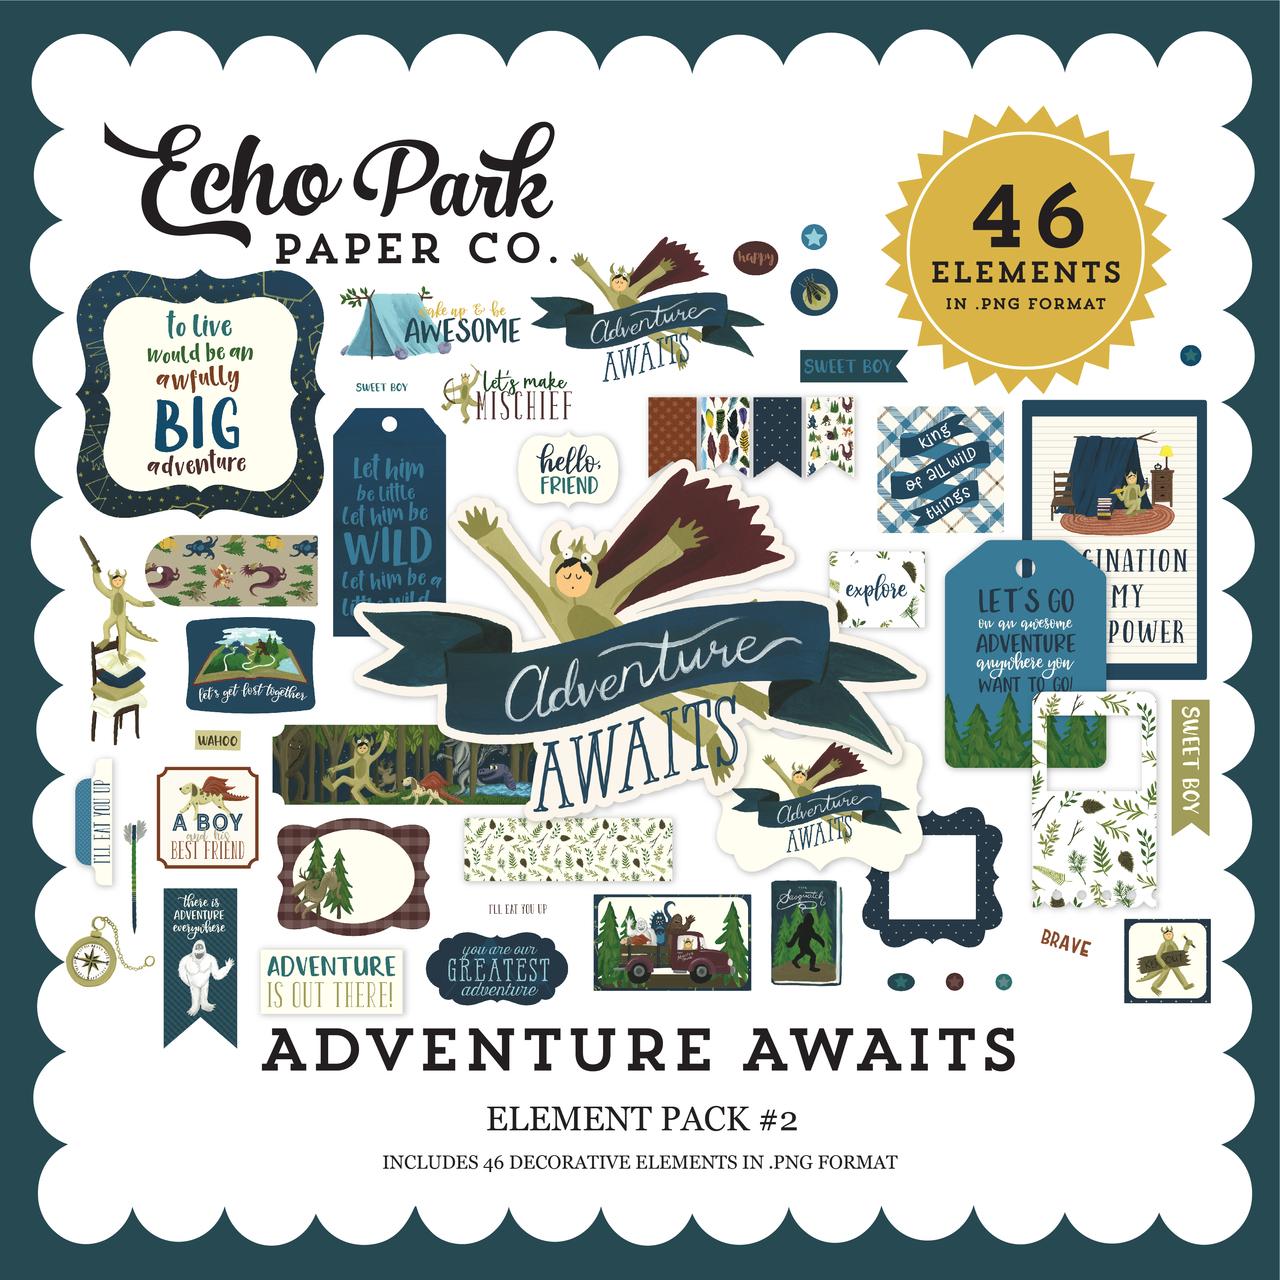 Adventure Awaits Element Pack #2